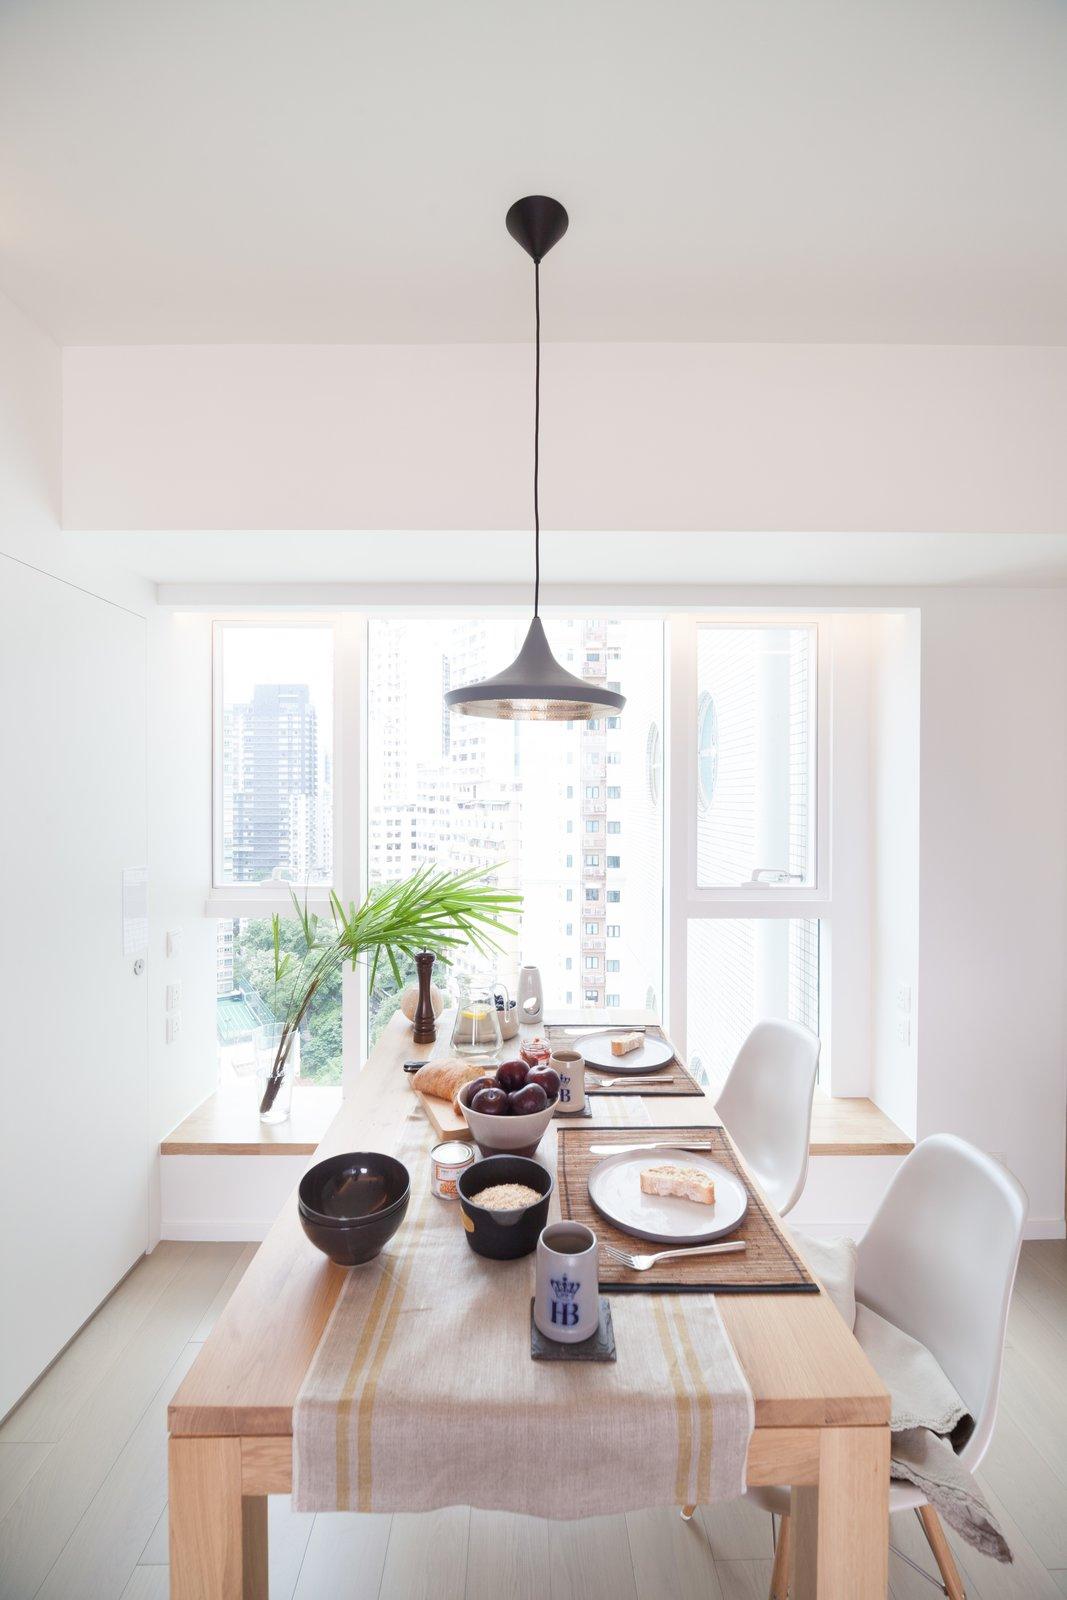 Dining Room http://www.cliftonleungdesignworkshop.com/Cherry+Crest+B  Cherry Crest by Clifton Leung